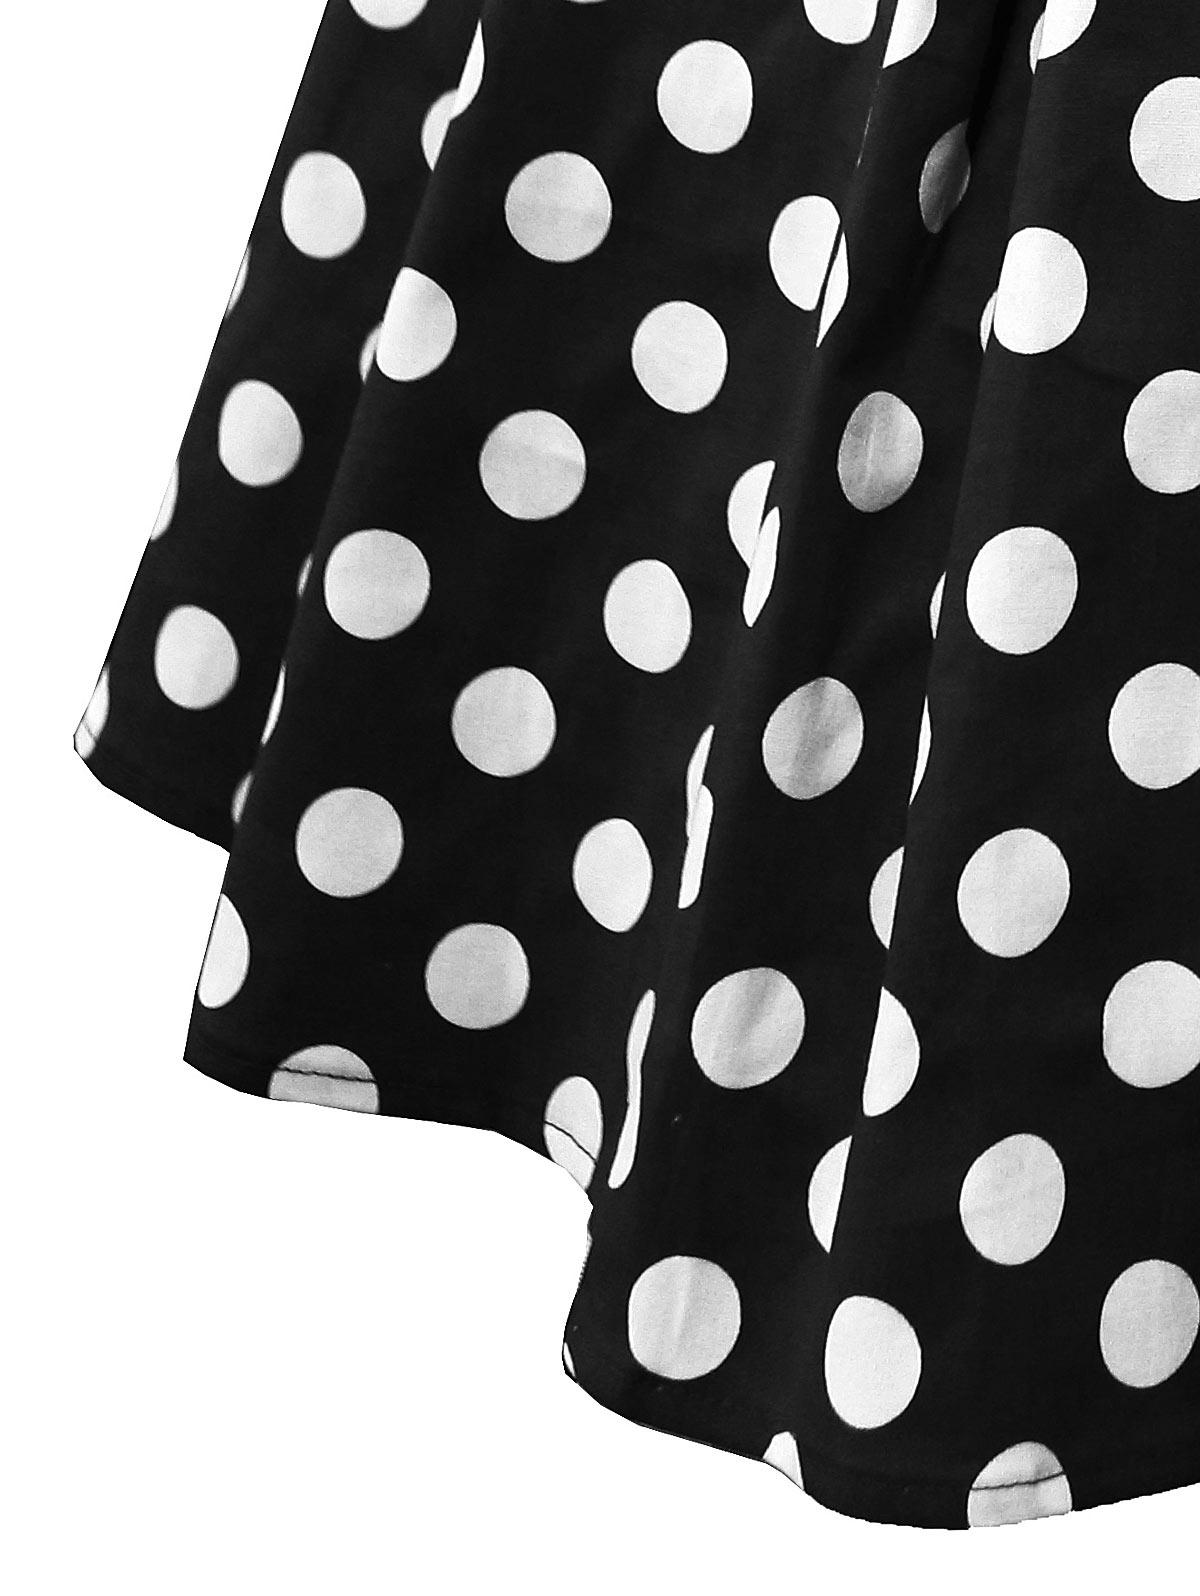 Wiplao Cotton Summer Women Skirt Red Black White Polka Dot High Waist Vintage Tutu Skater faldas mujer Casual Swing Midi Skirts